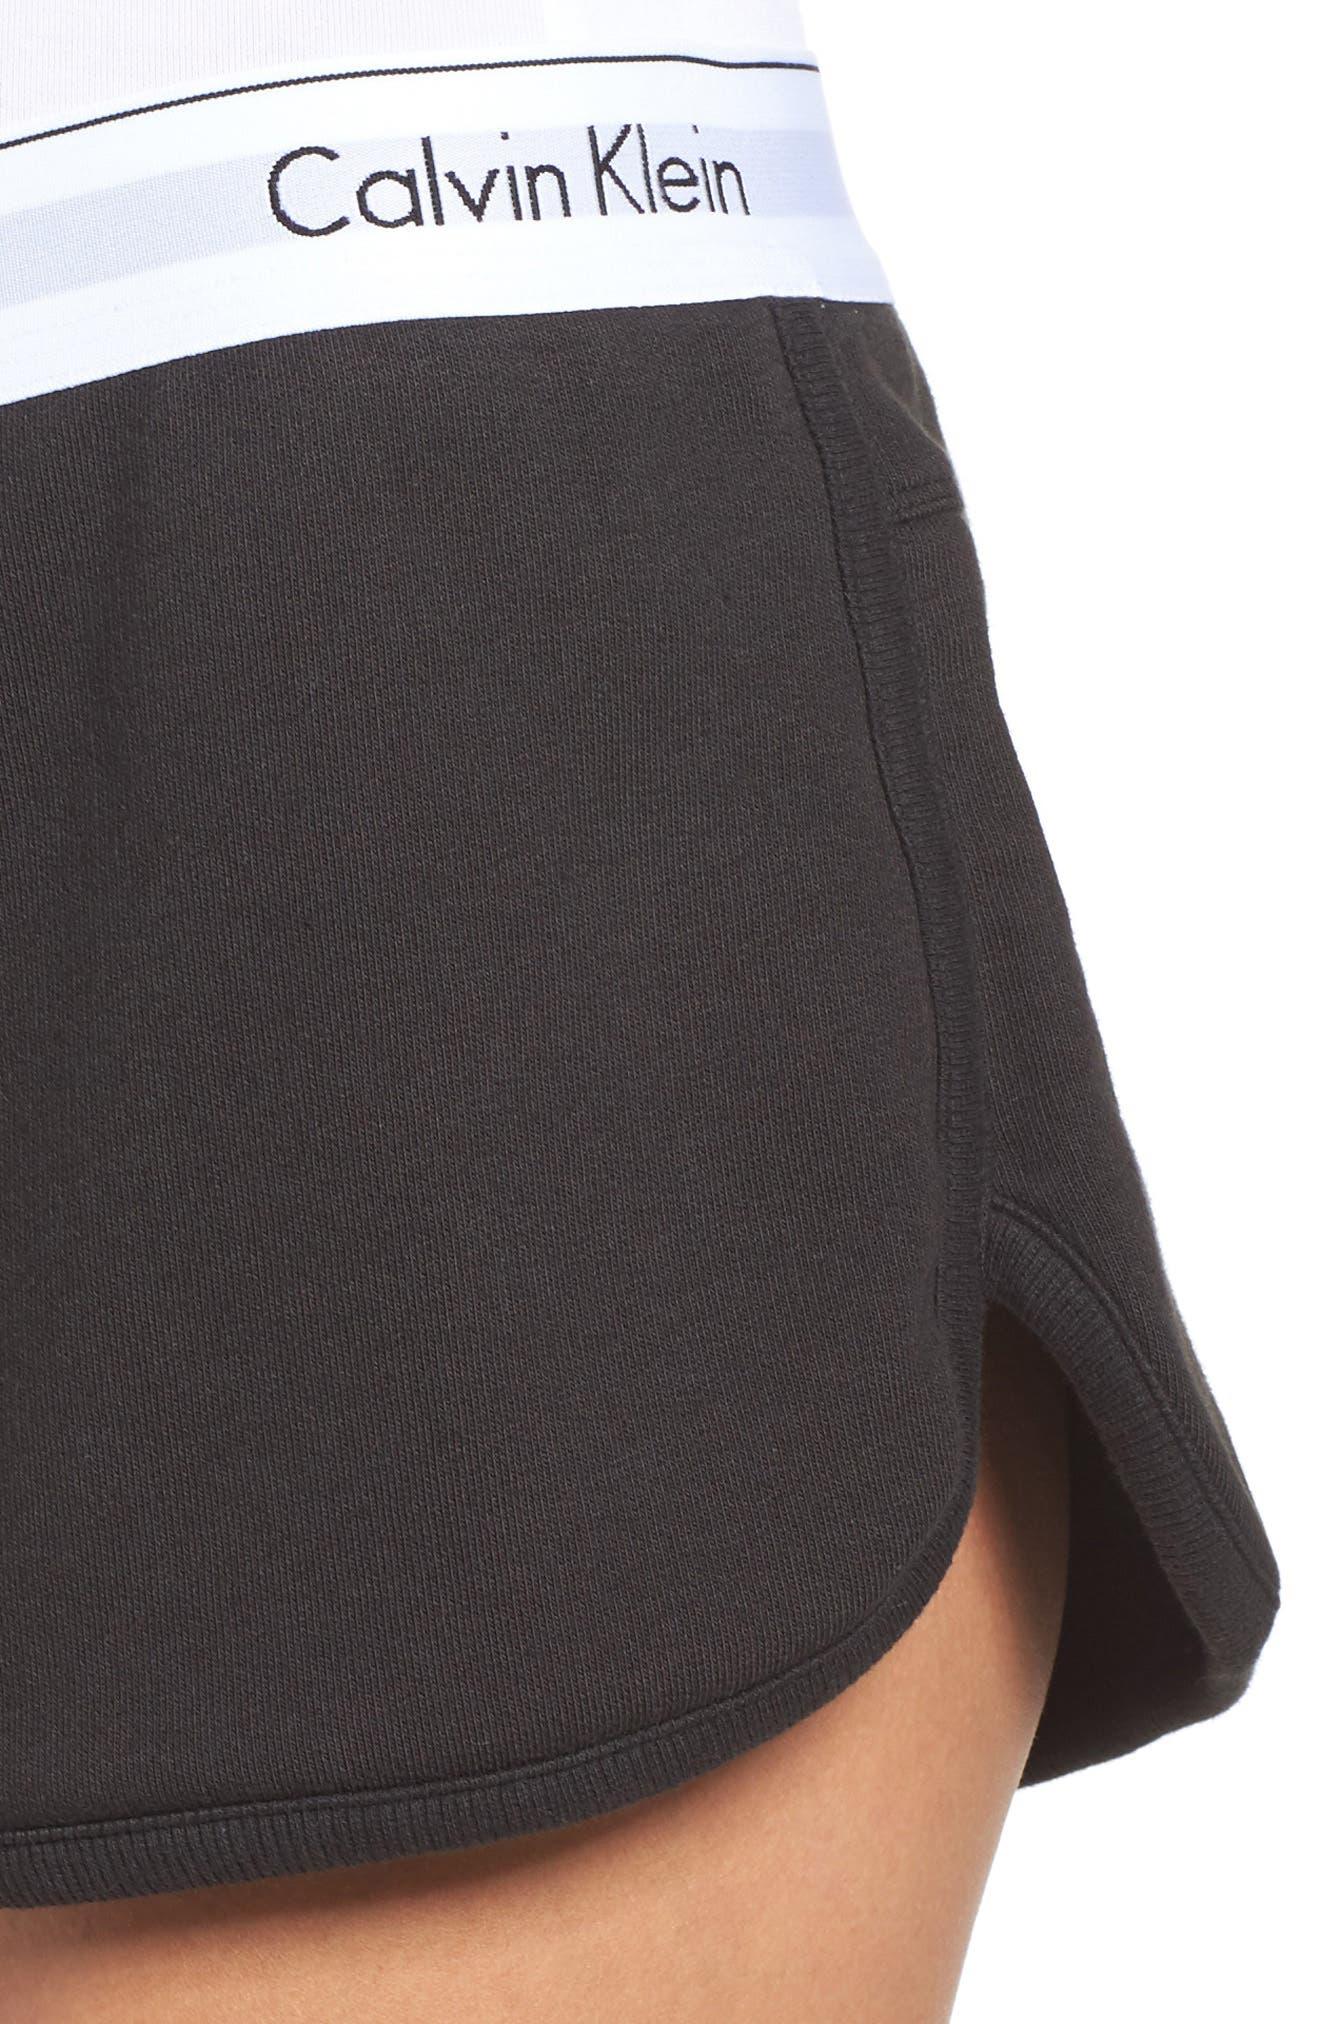 Lounge Shorts,                             Alternate thumbnail 4, color,                             001